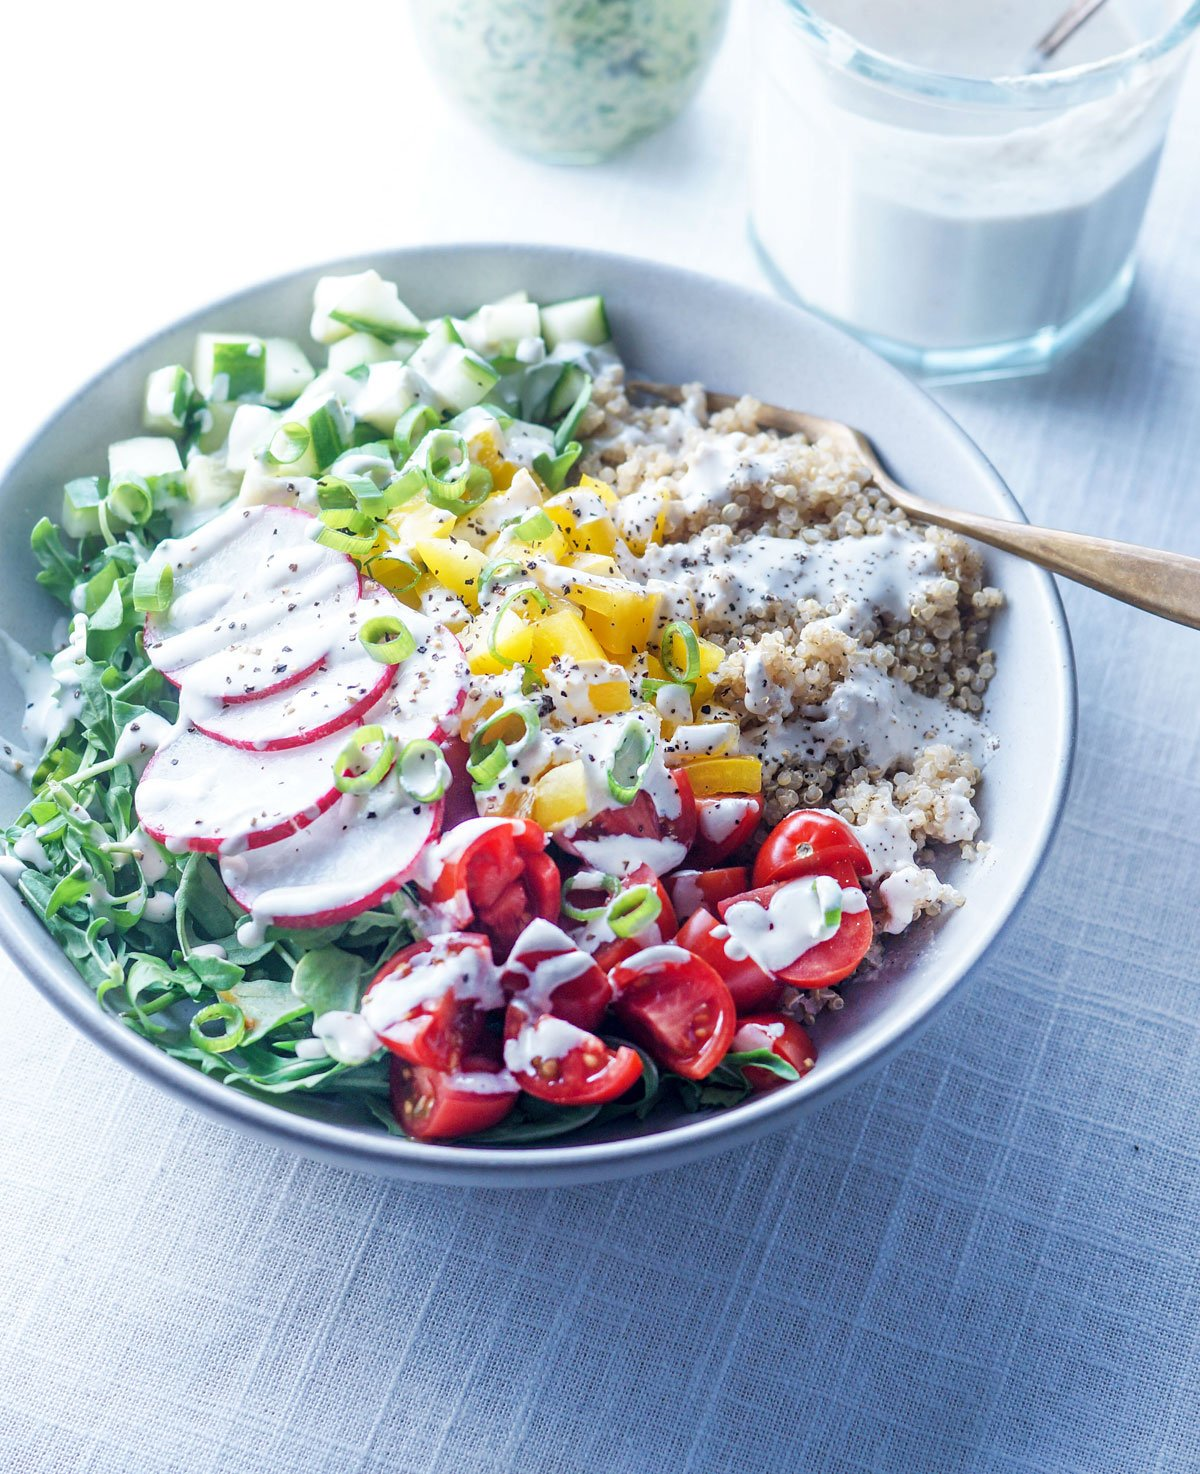 Make-Ahead Vegan Lunch Bowls